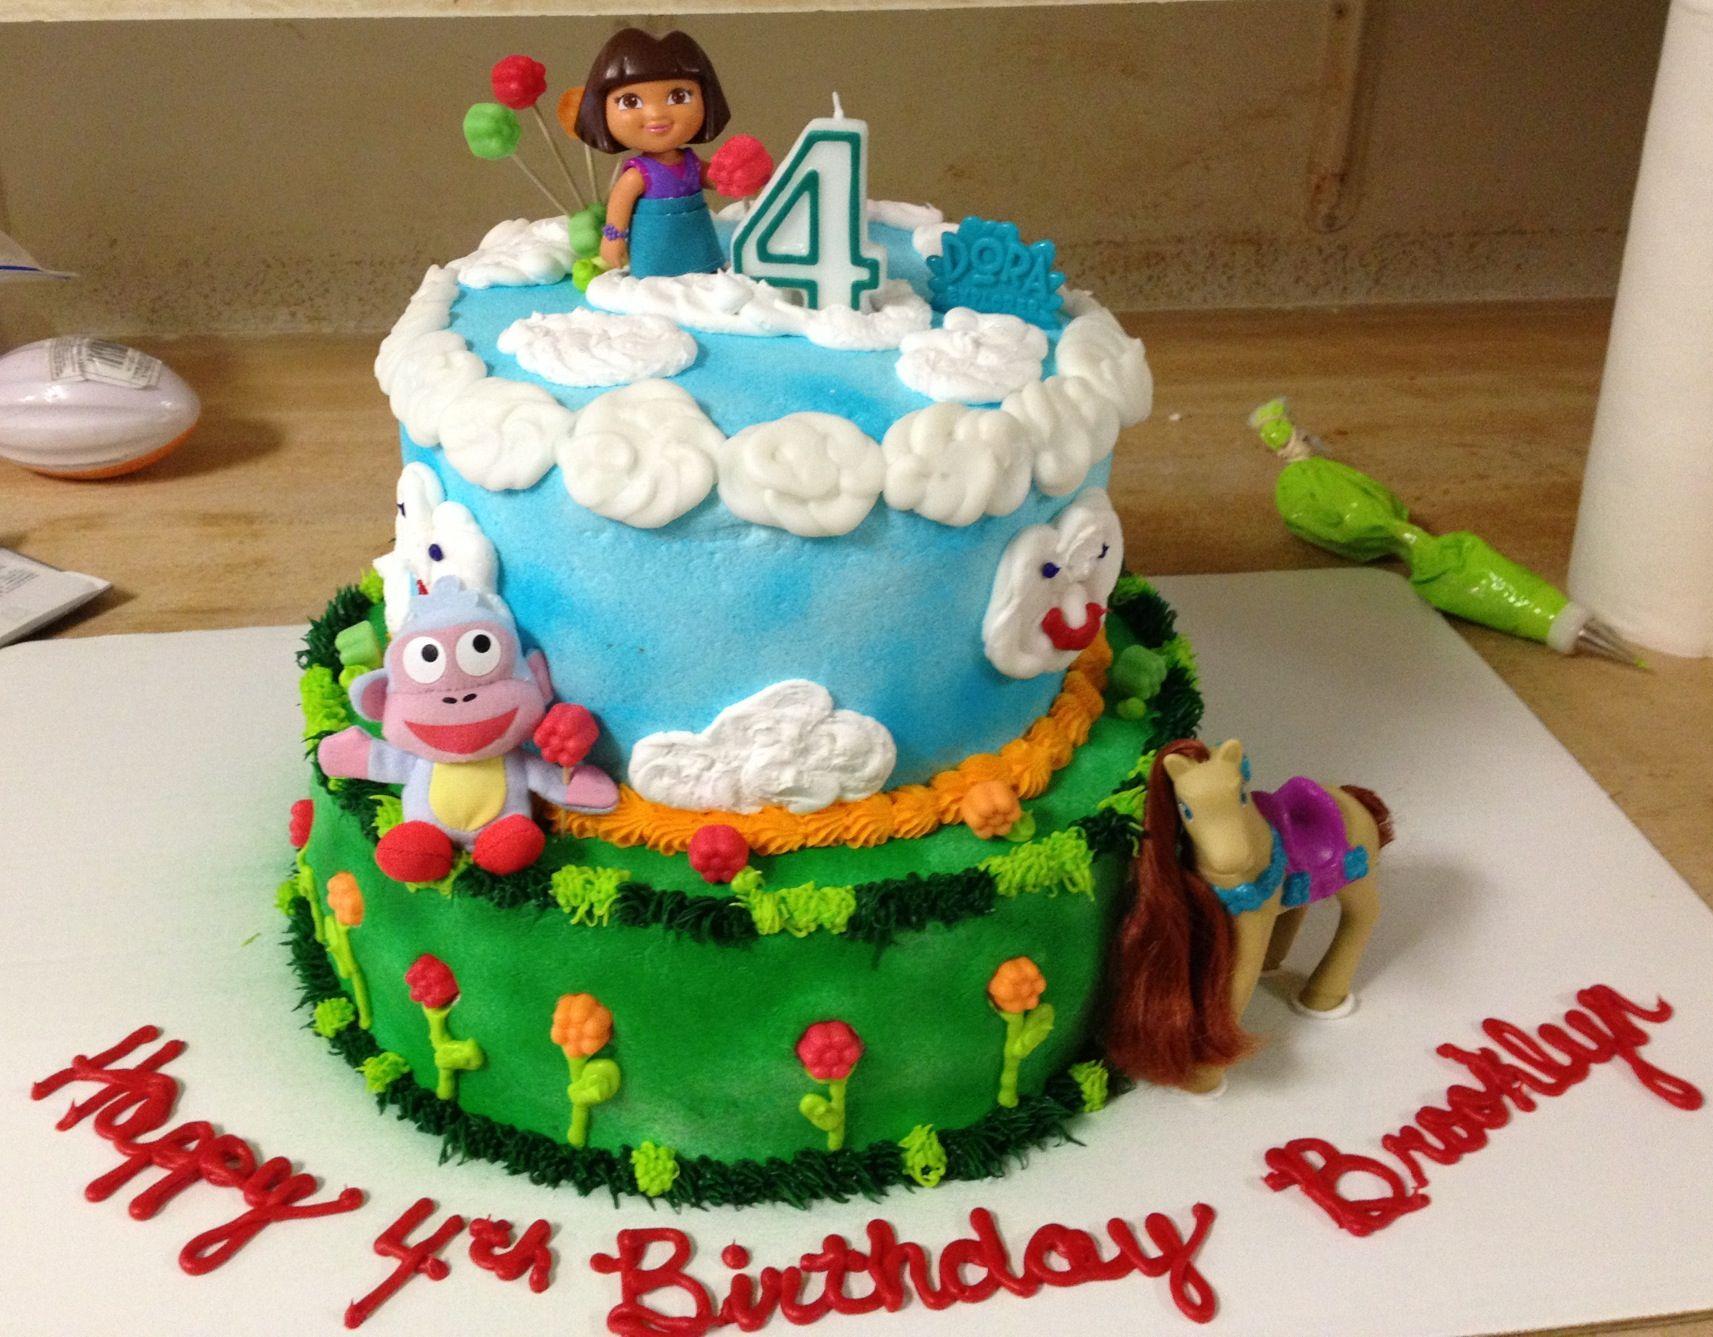 Dora Cake Recipe In English: Dora Birthday Cake